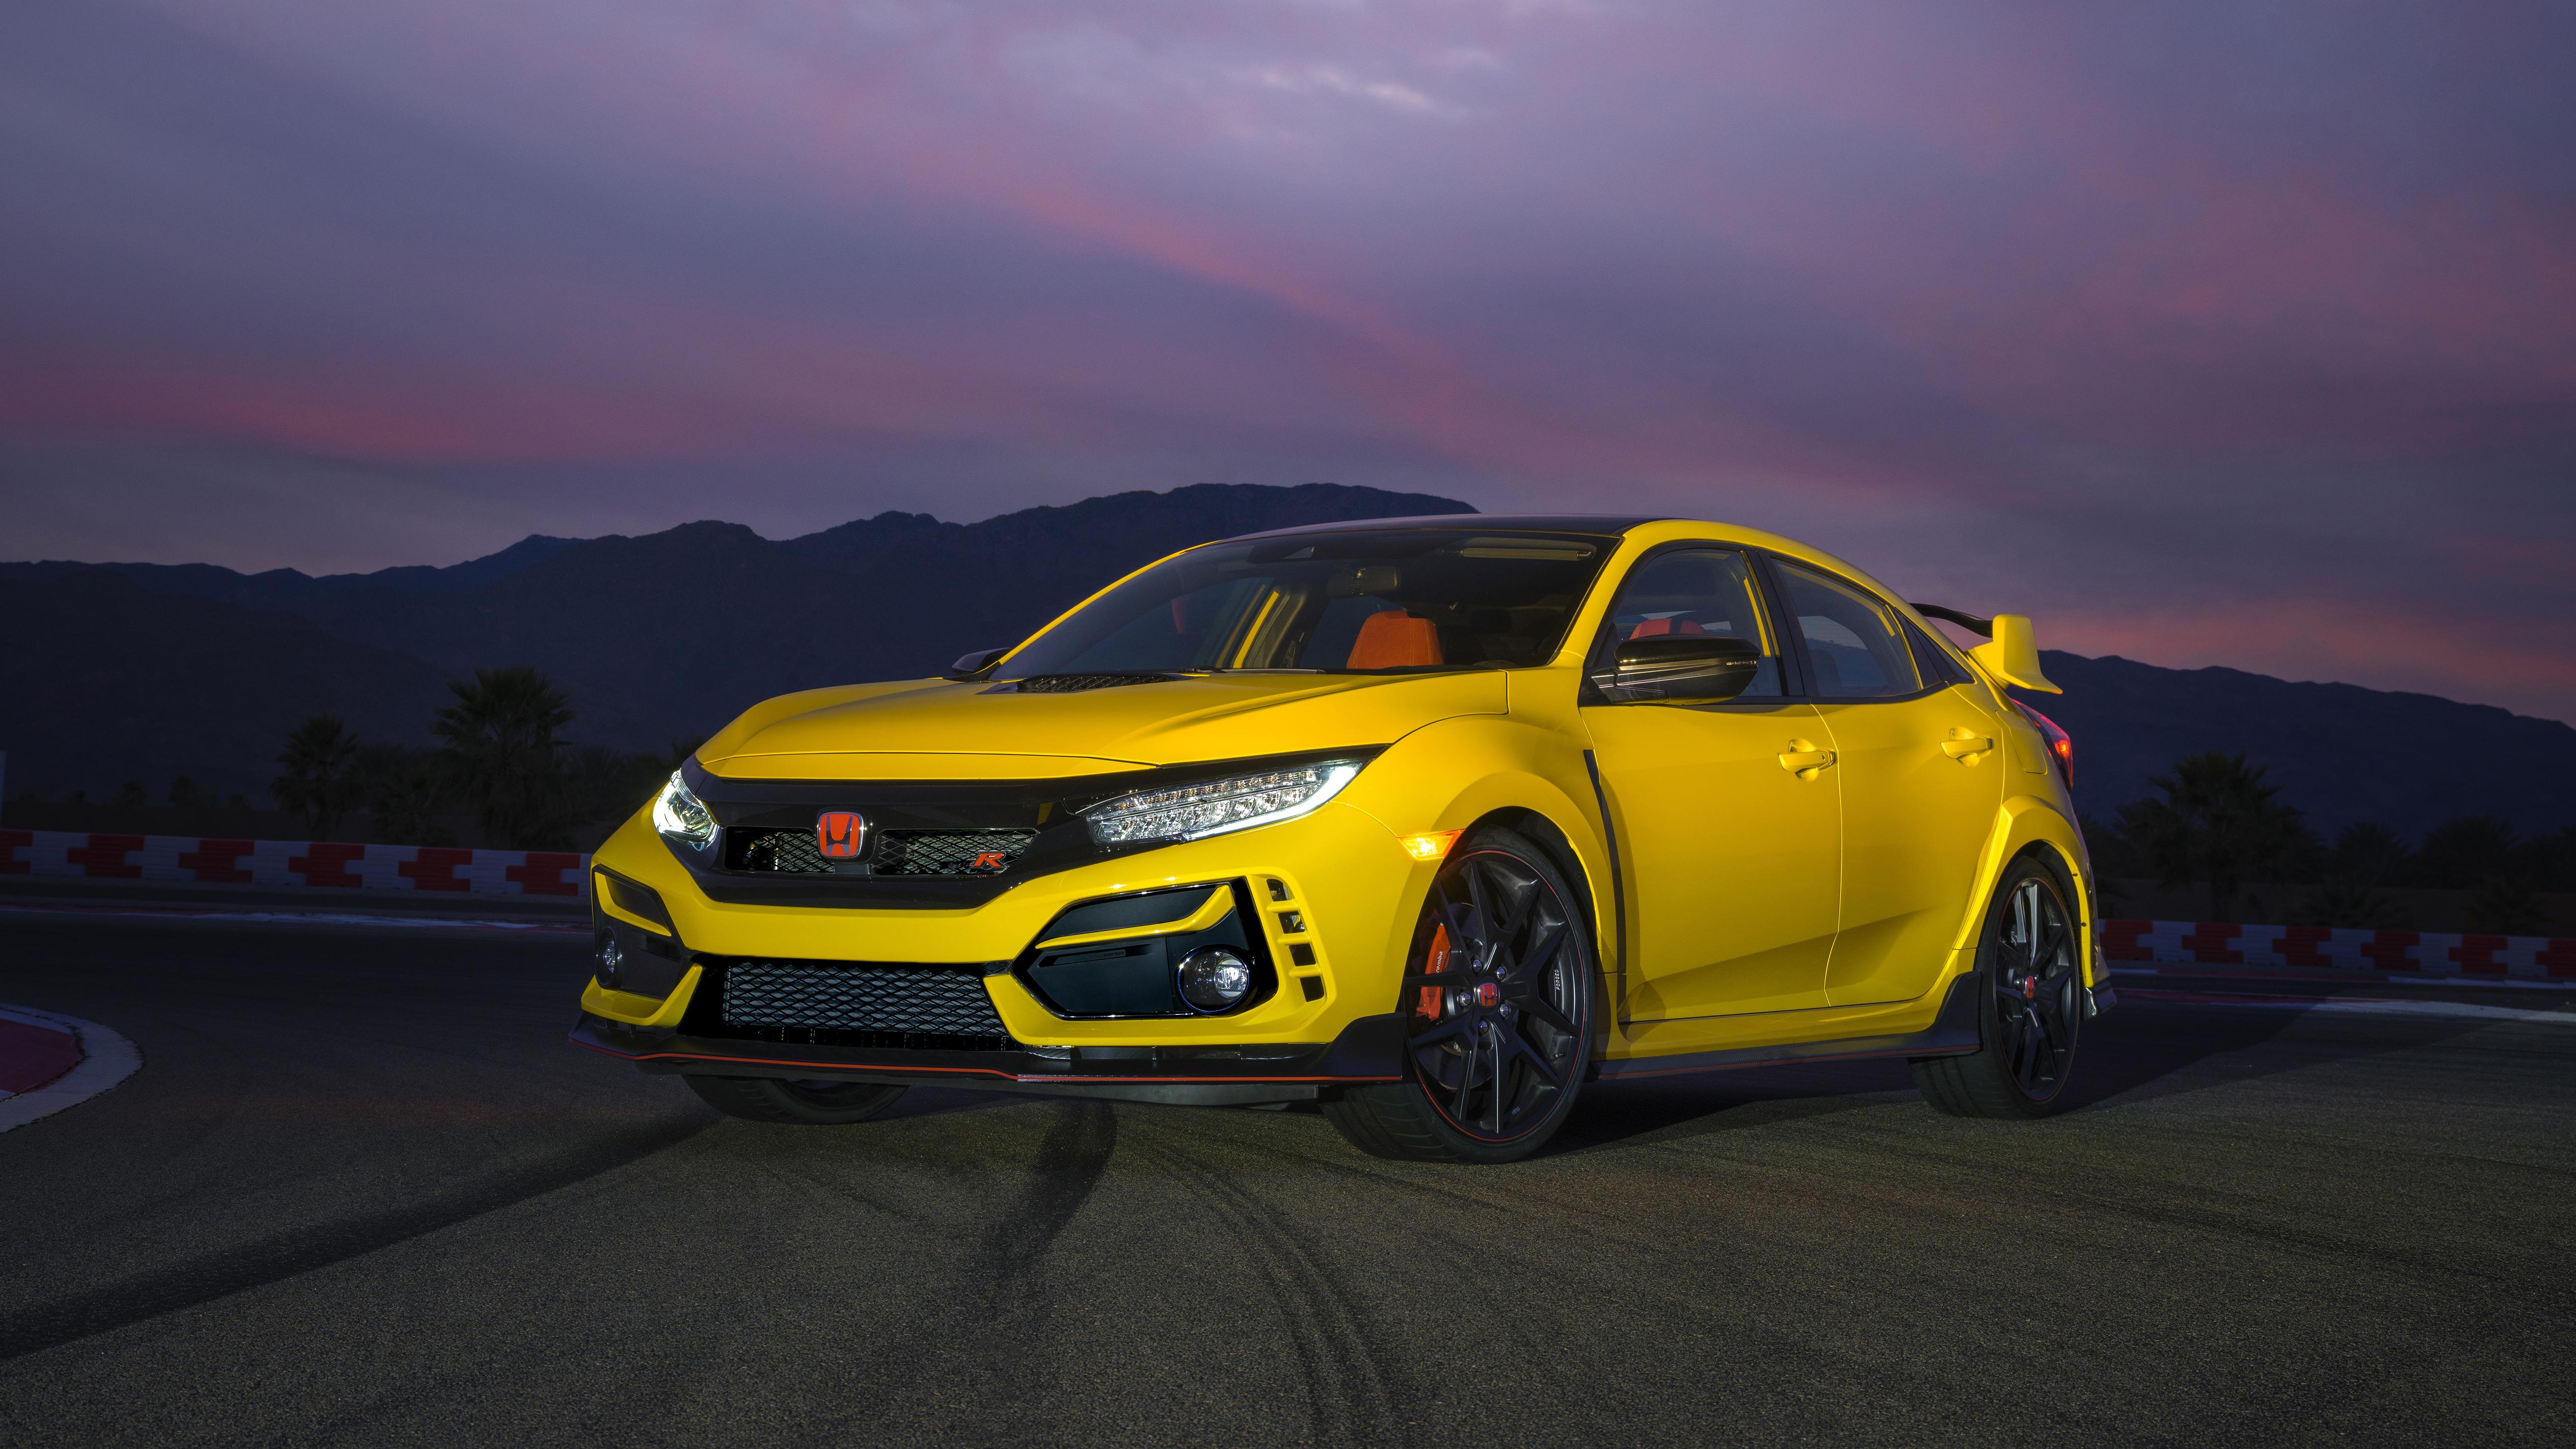 2021 Honda Civic Type R Limited Edition 5K Wallpaper